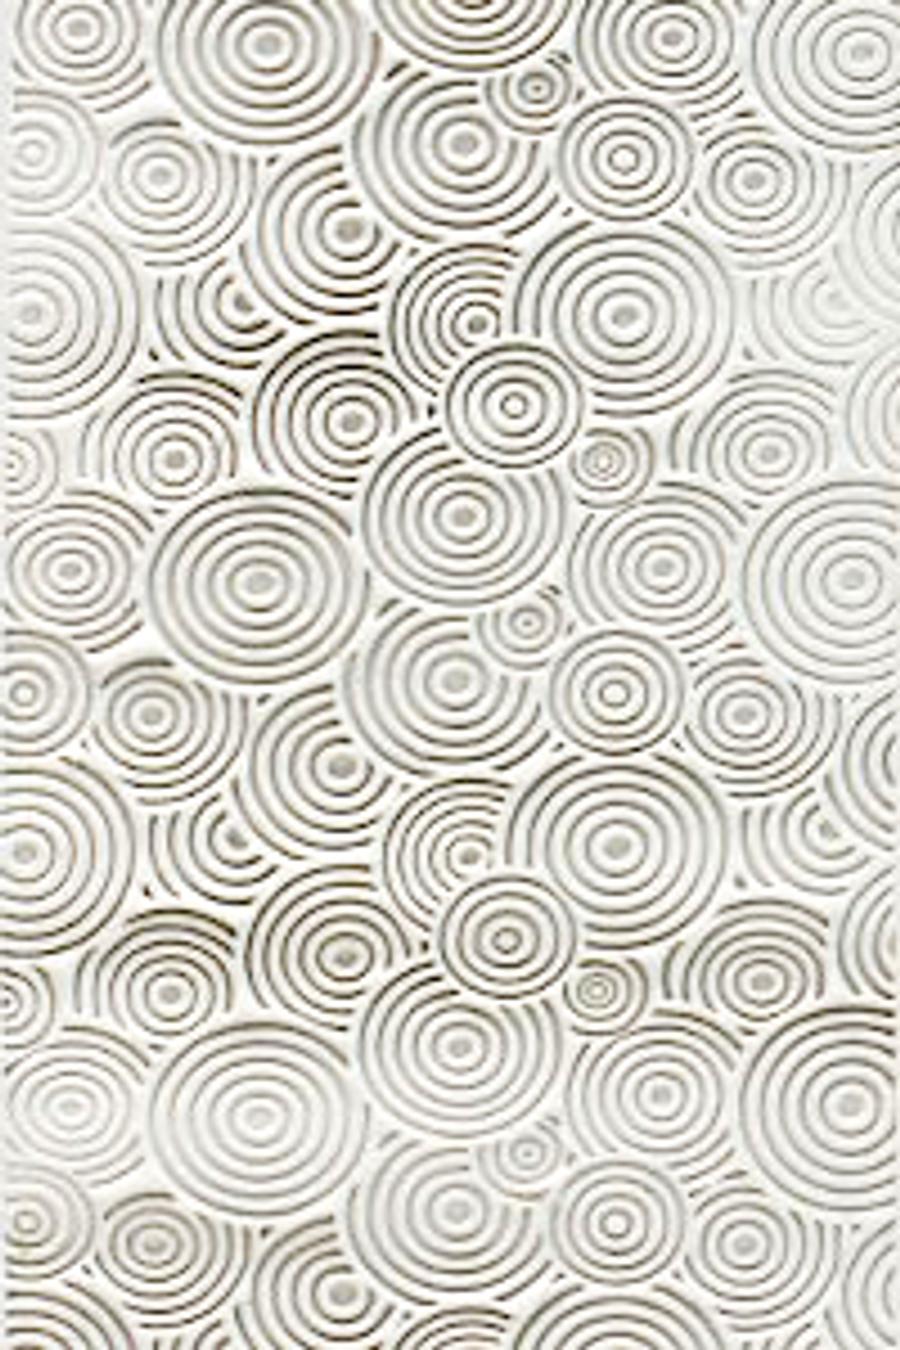 Acrylic Texture Roller - Raindrop Ripples 5cm